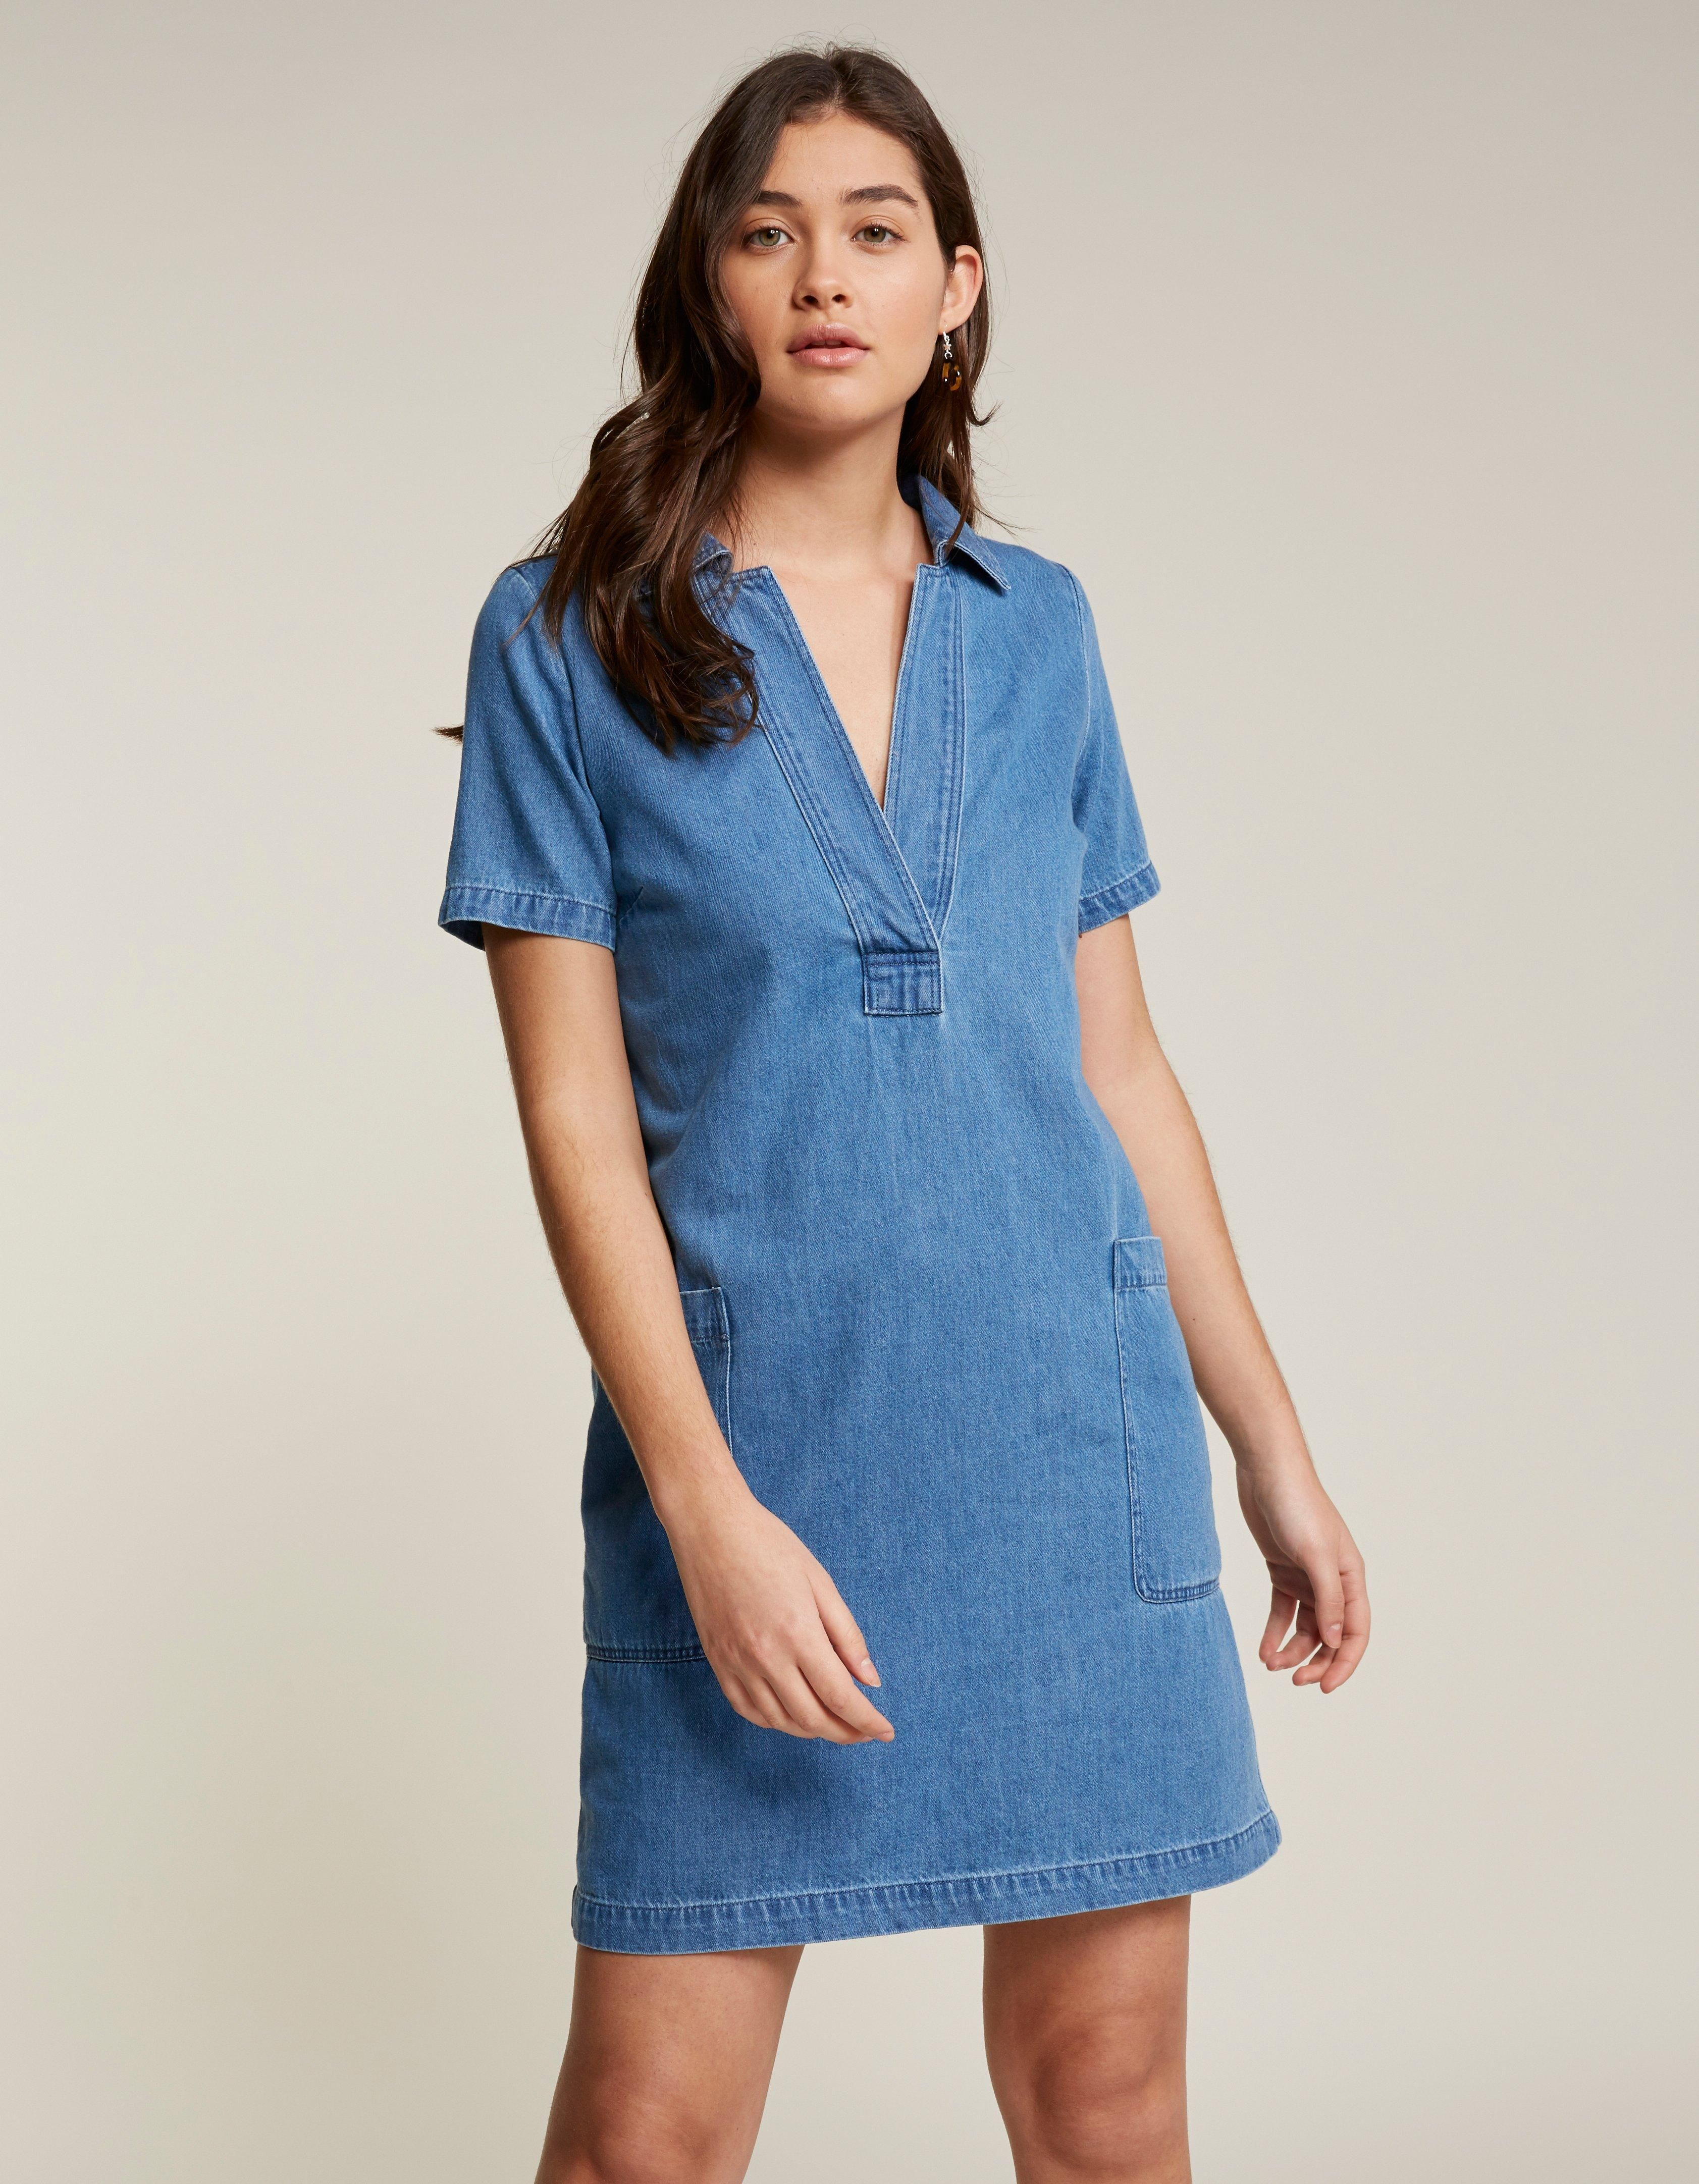 Women's short sleeve denim dress with v-neck | Womens denim dress ...